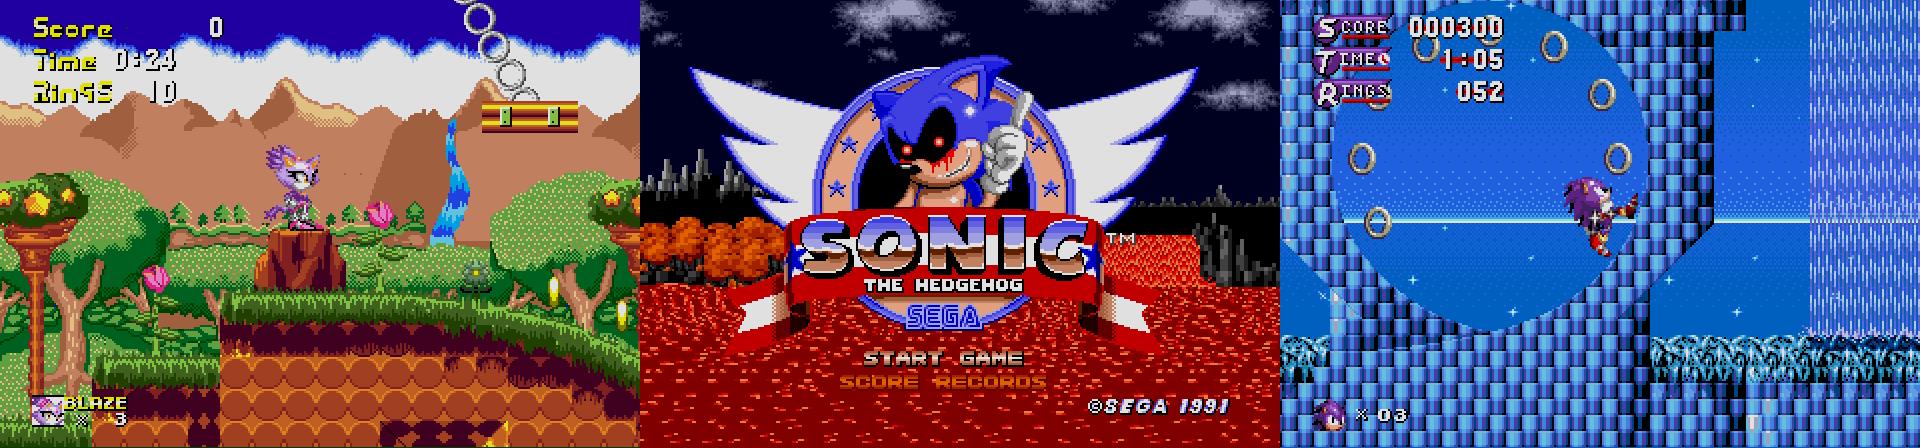 Sonic hacks